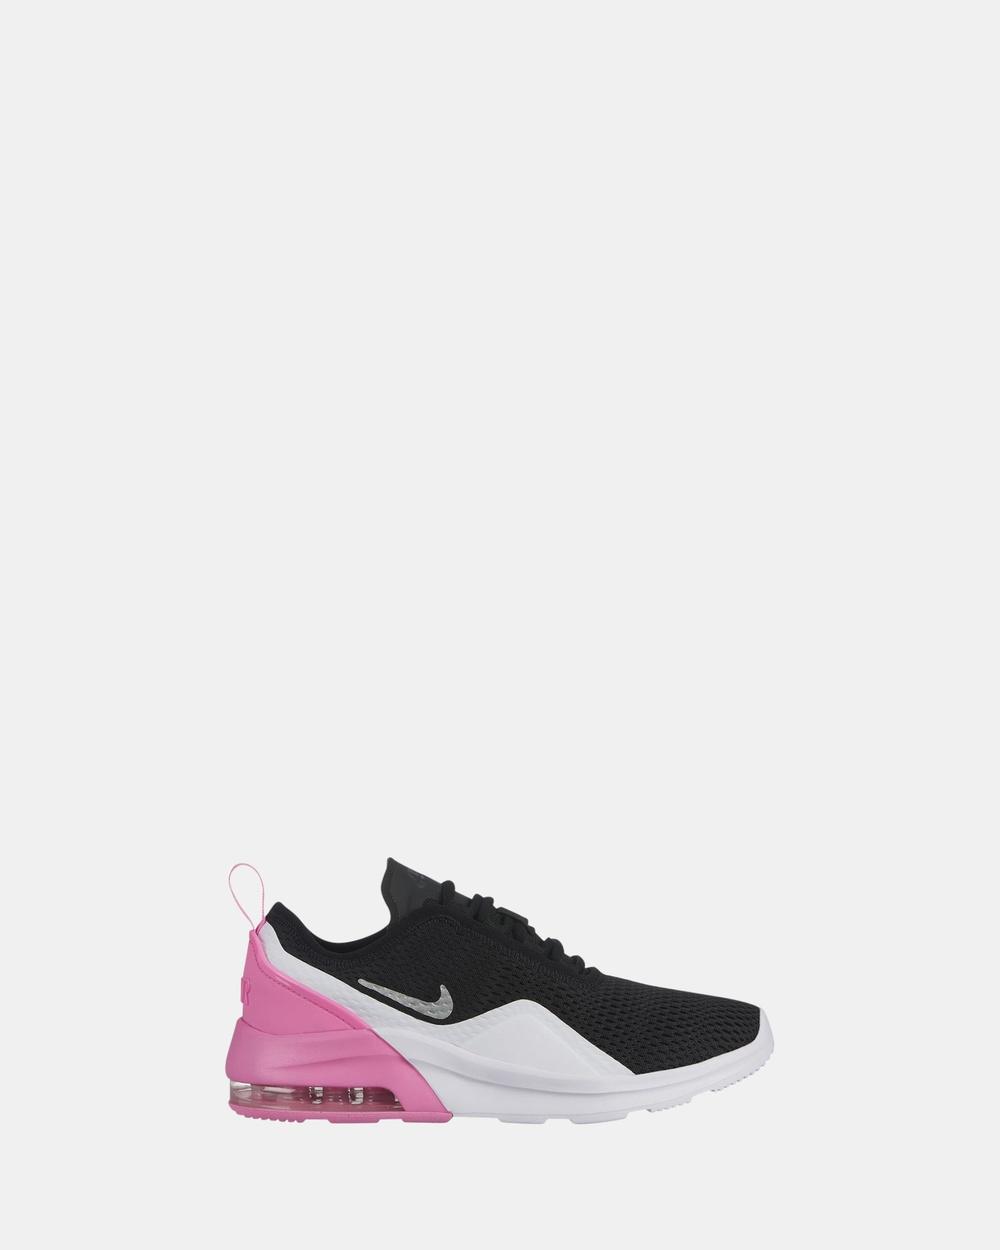 Nike - Air Max Motion 2 Grade School - Sneakers (Black Pink White) Air Max  Motion 2 Grade School 1856b00b2df1d